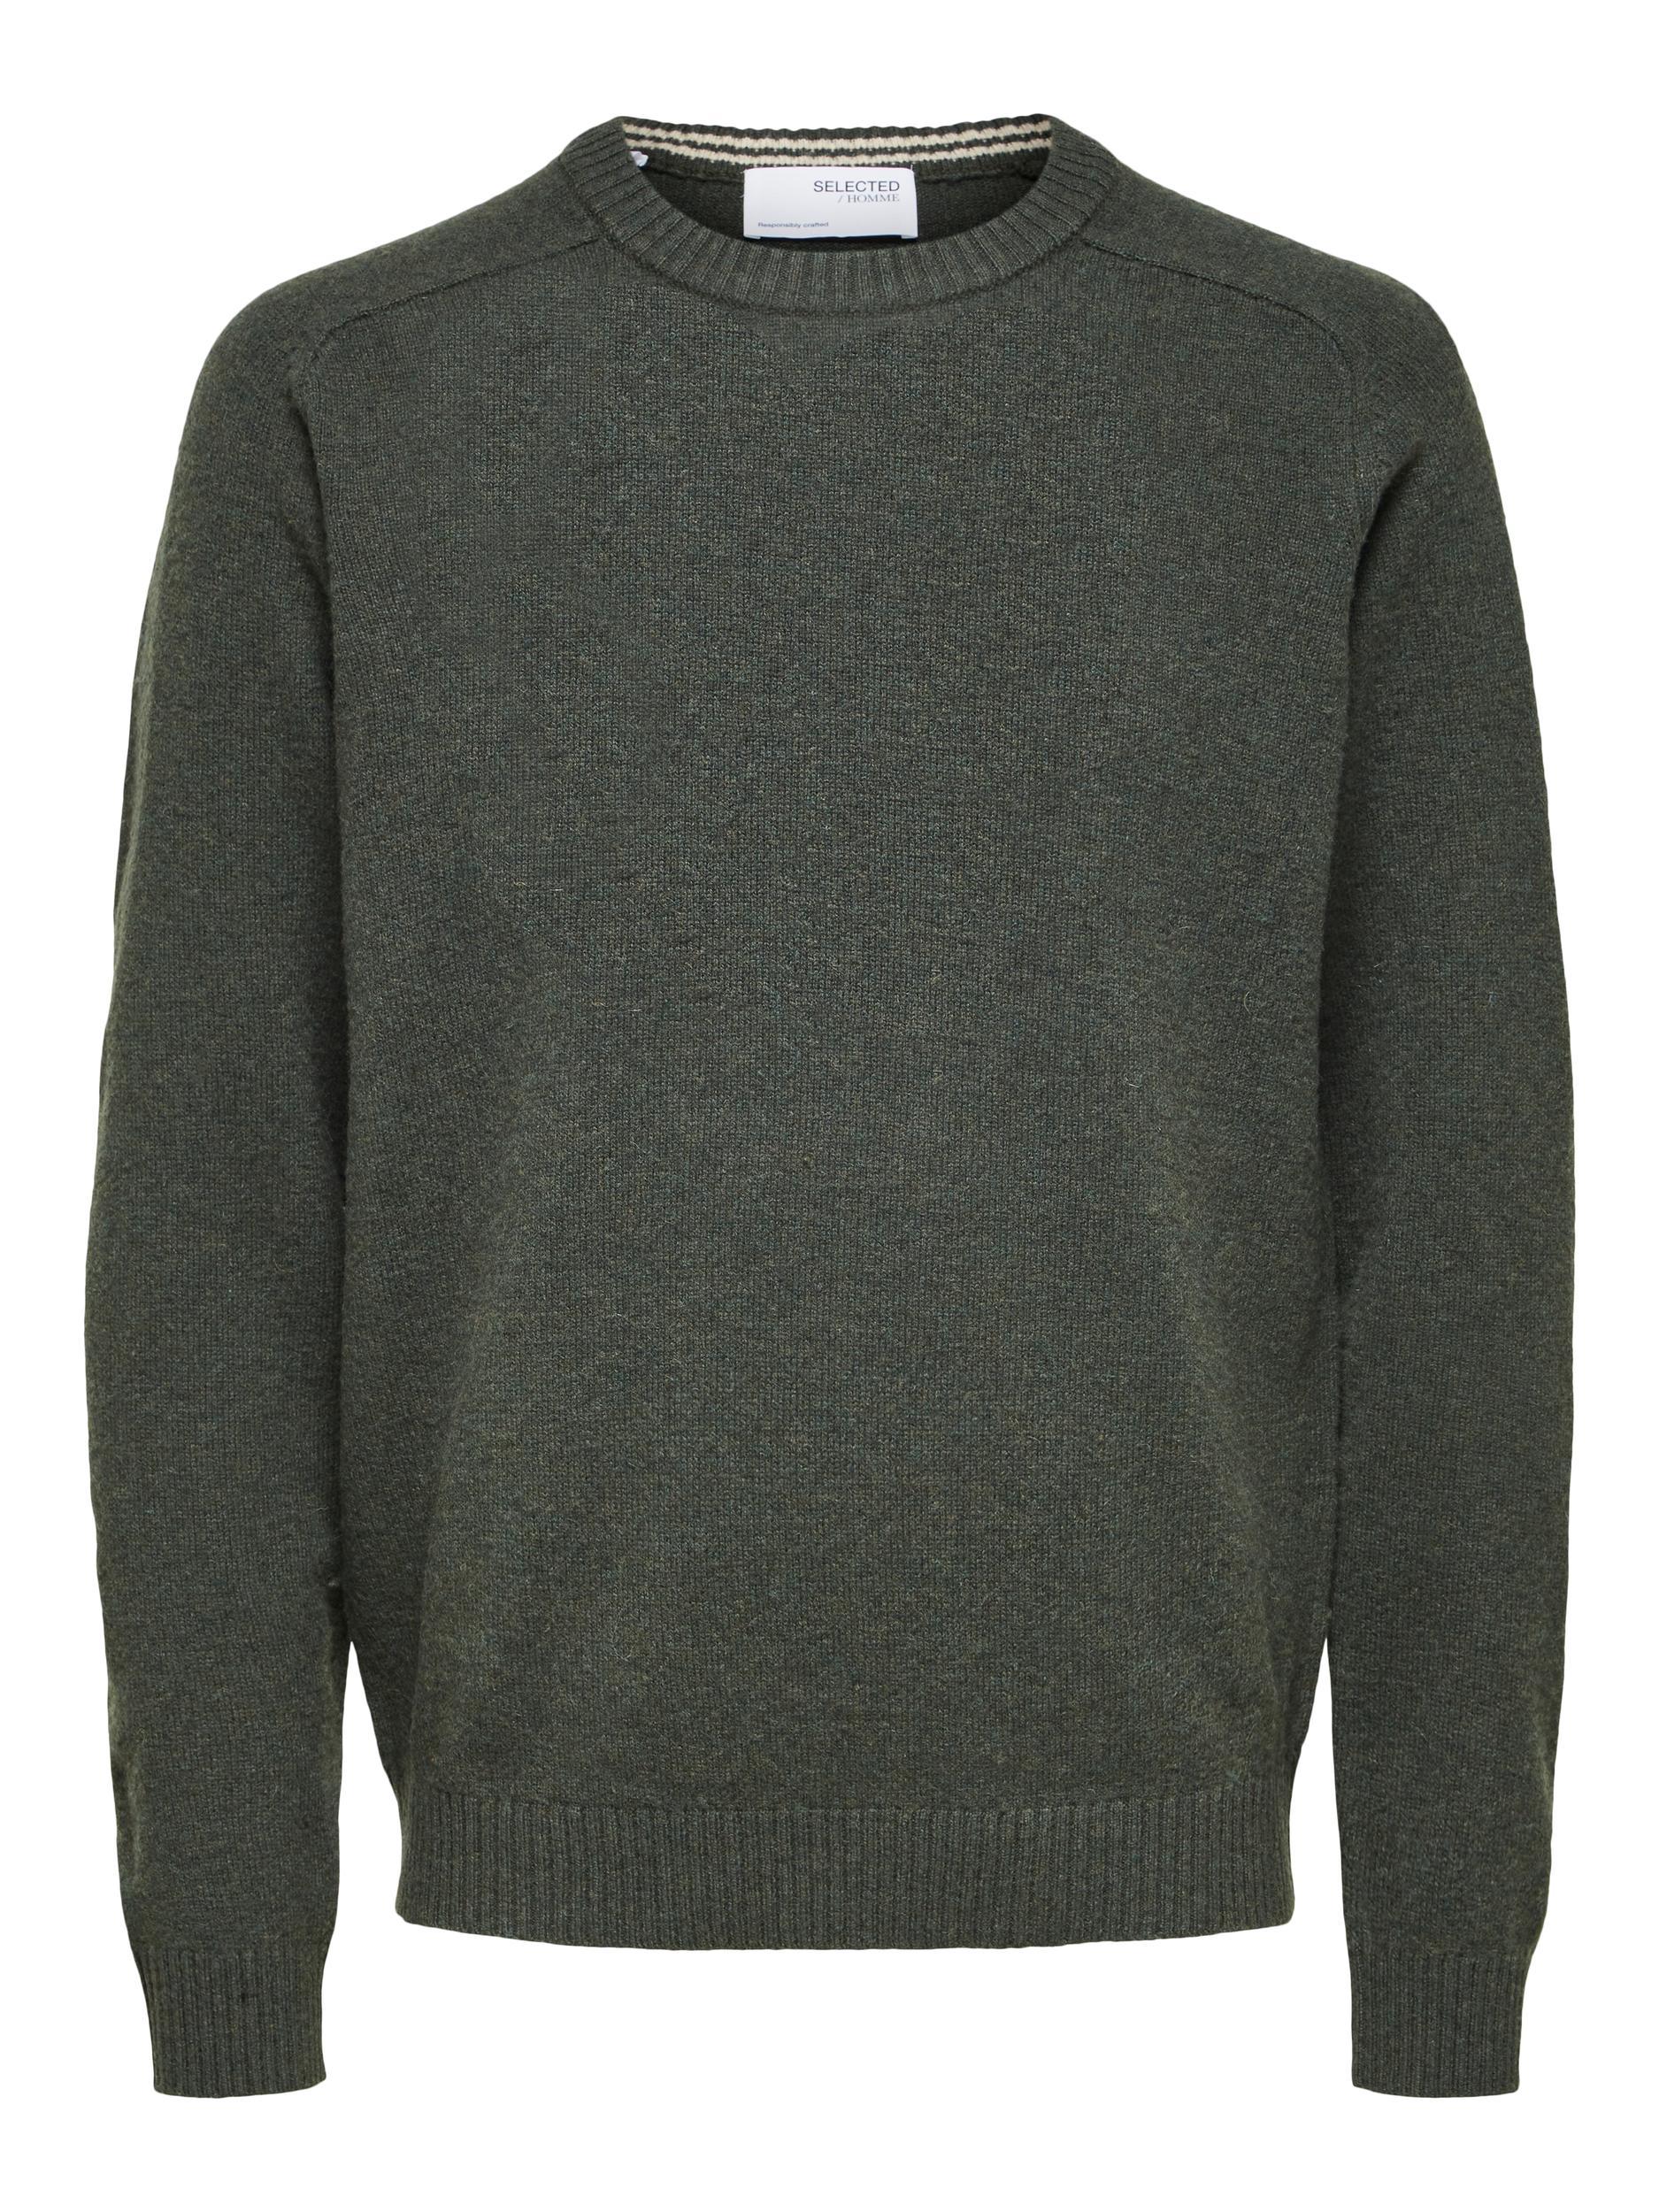 Selected Homme Newcoban LS trøje